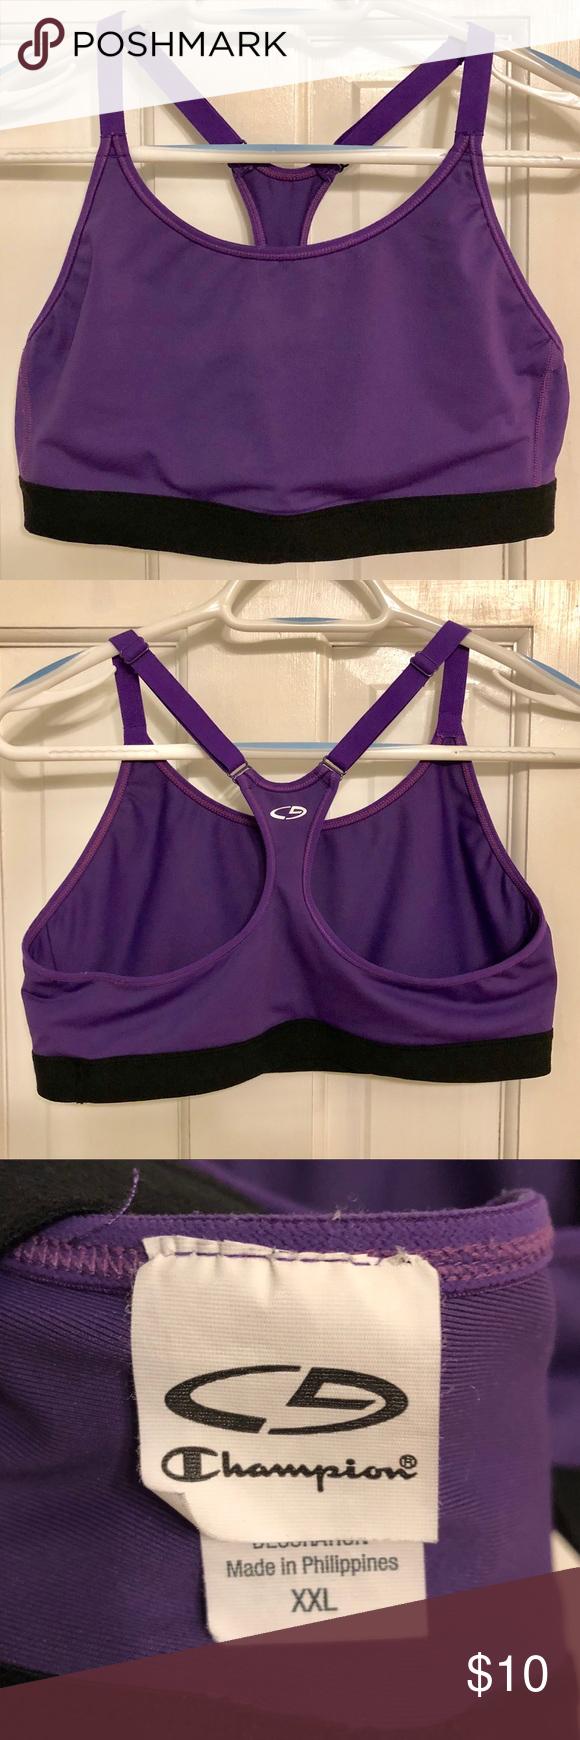 EUC C9 by Champion Sports Bra in Bright Purple C9 by